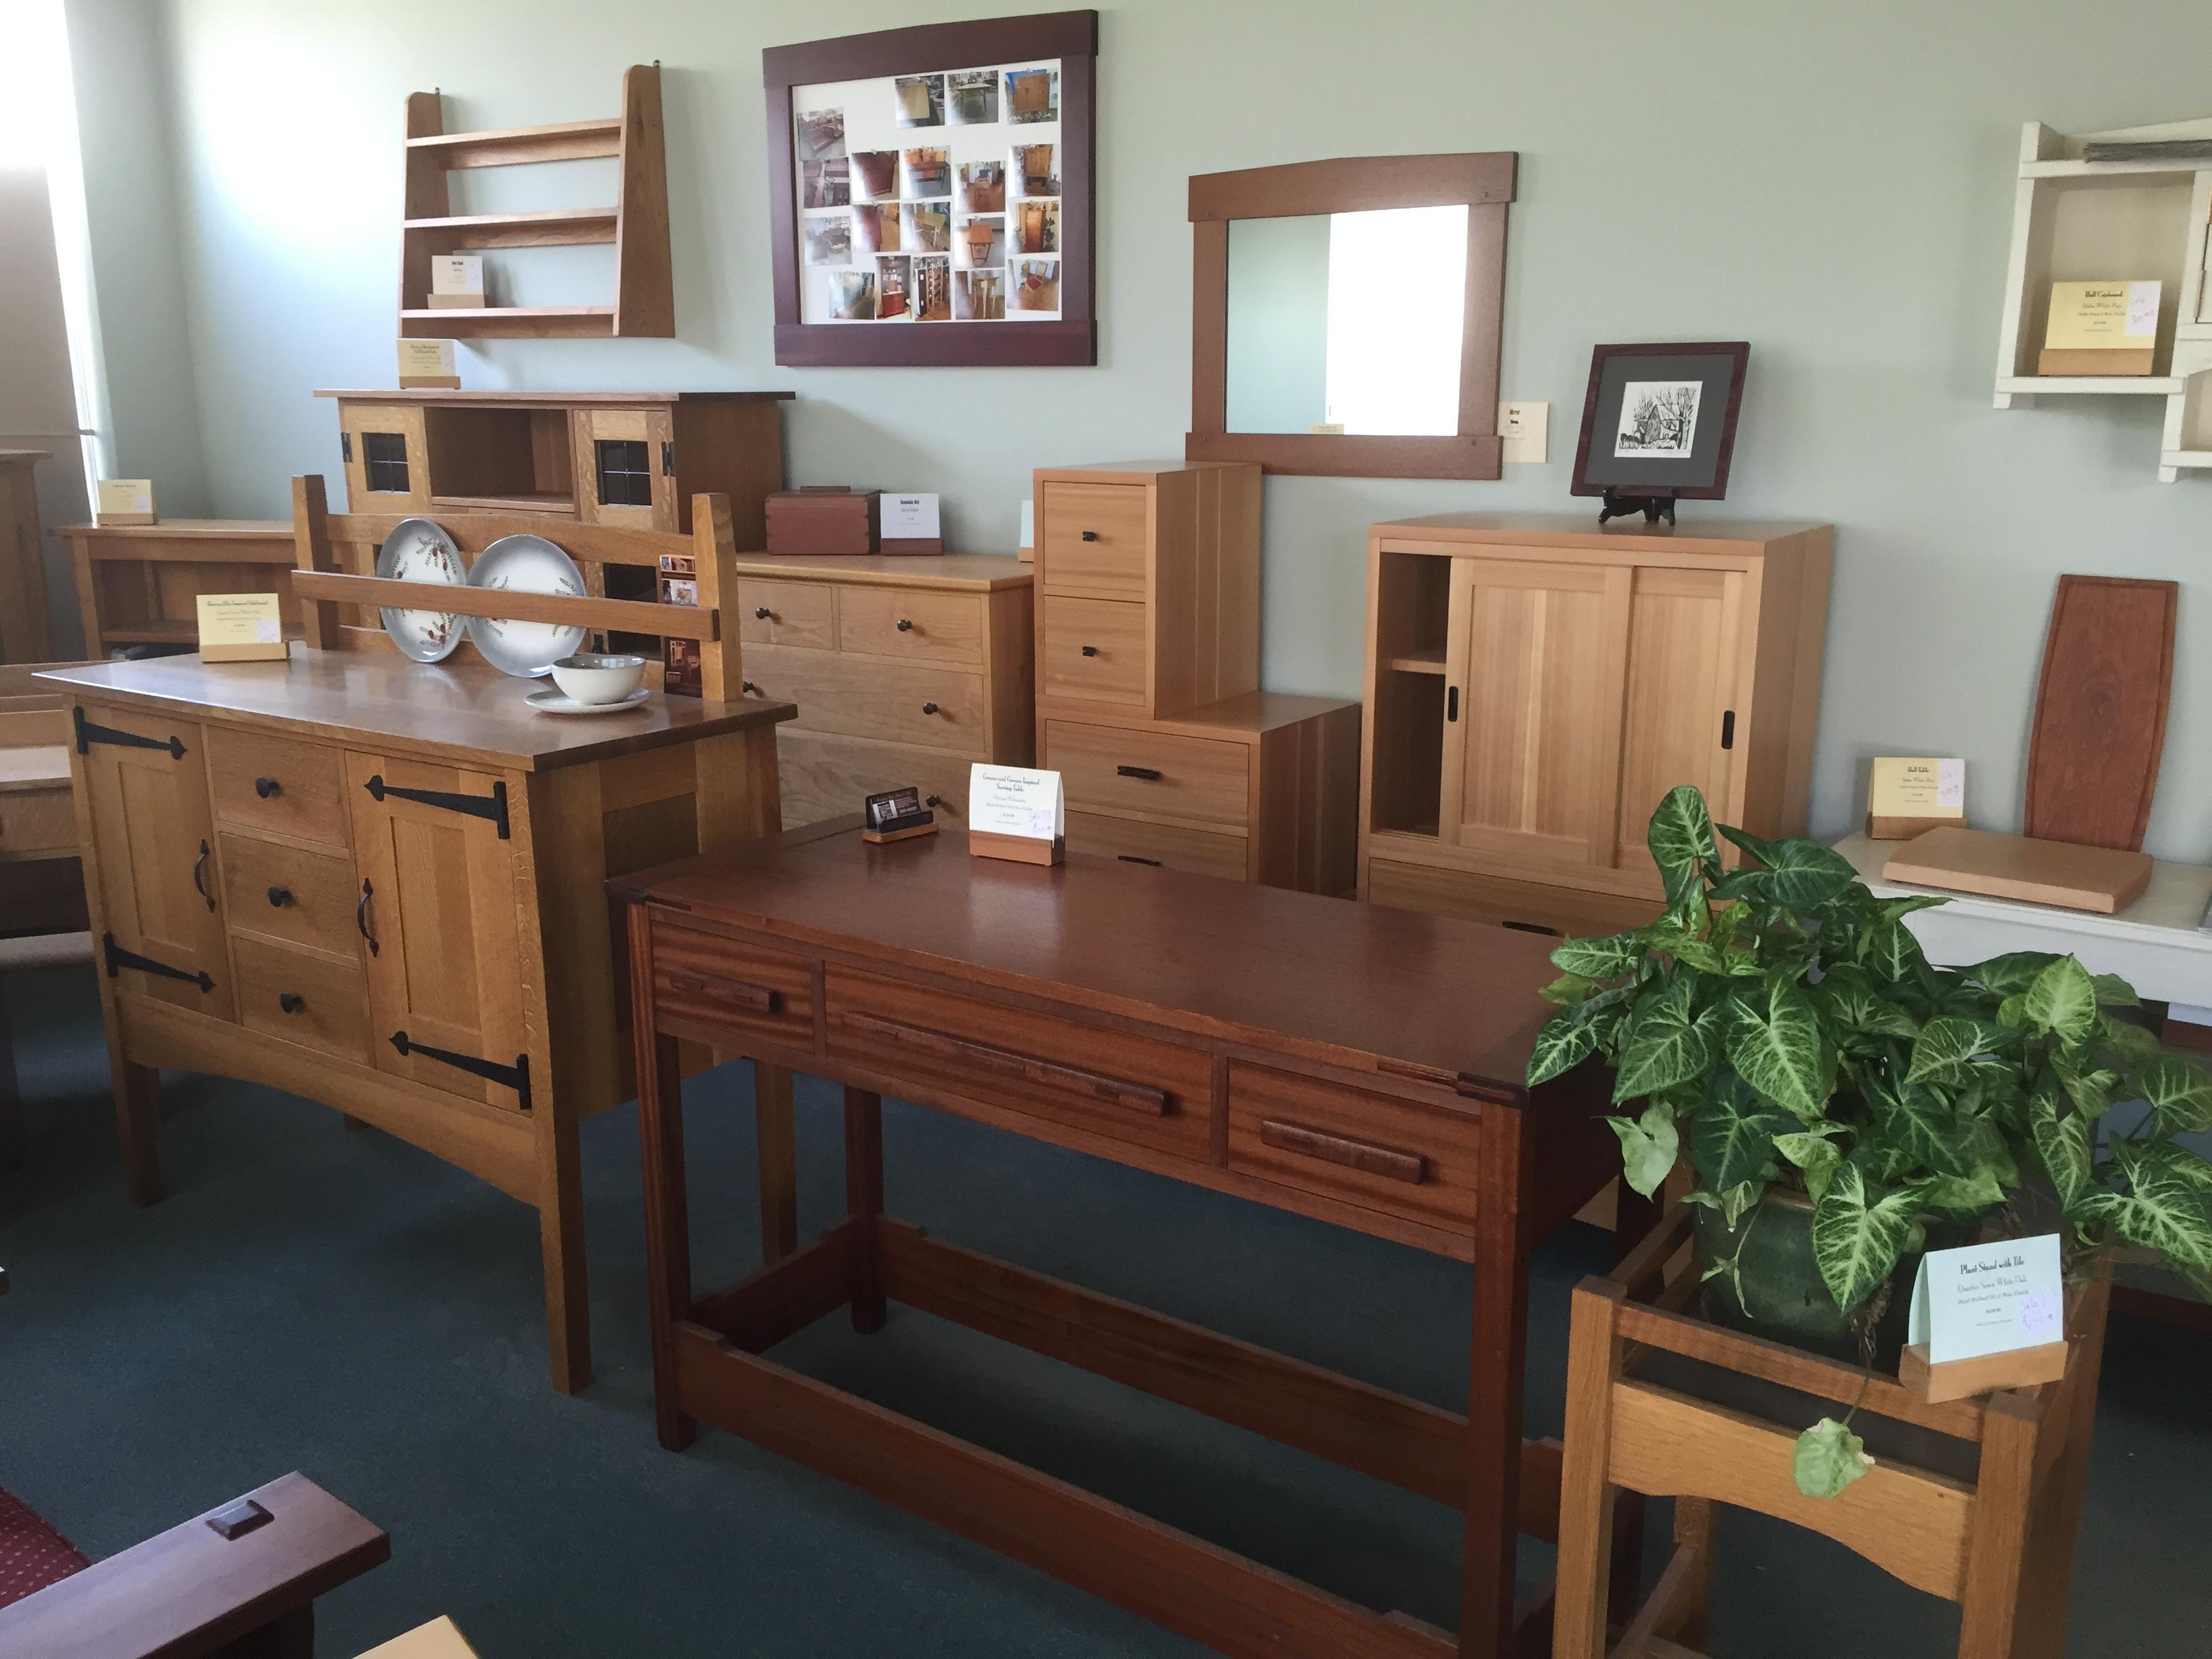 kinds of furniture. IMG_0075 IMG_0076 Kinds Of Furniture L